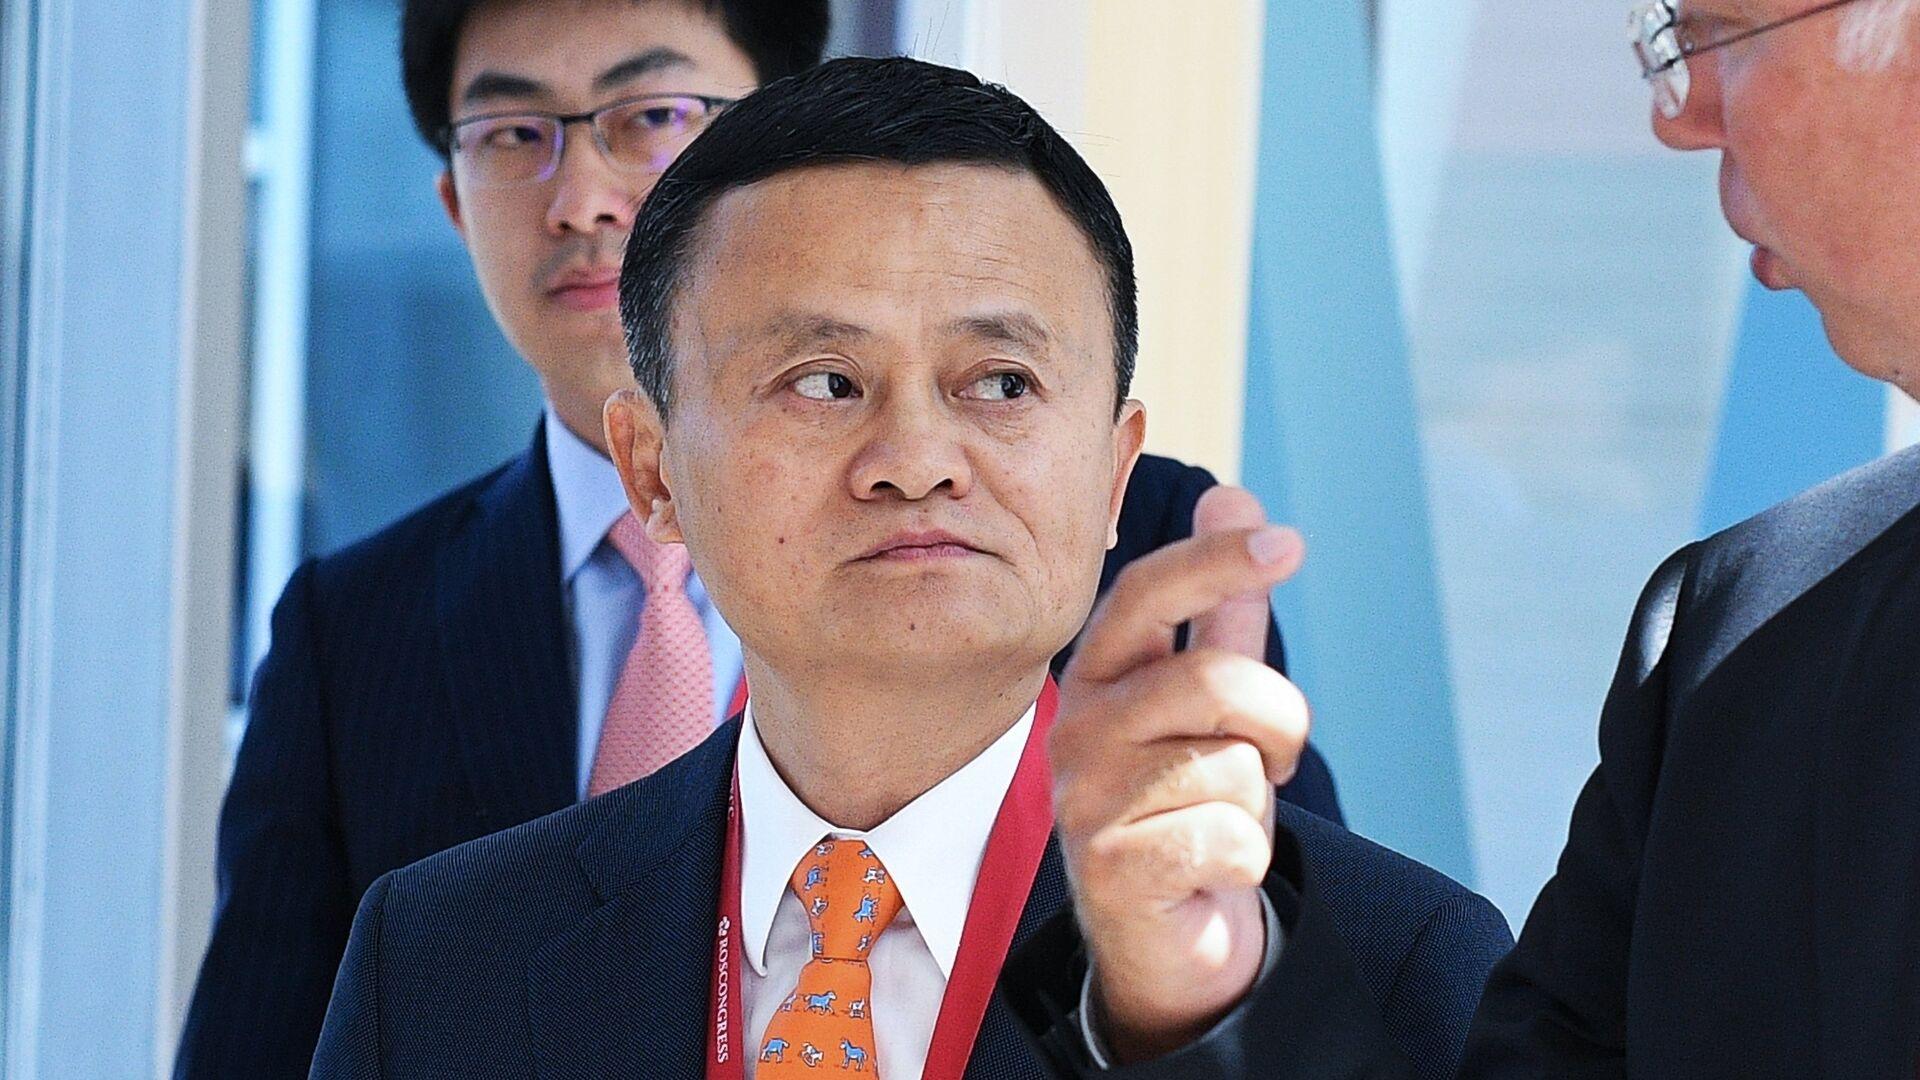 Jack Ma, fundador de Alibaba - Sputnik Mundo, 1920, 25.12.2020